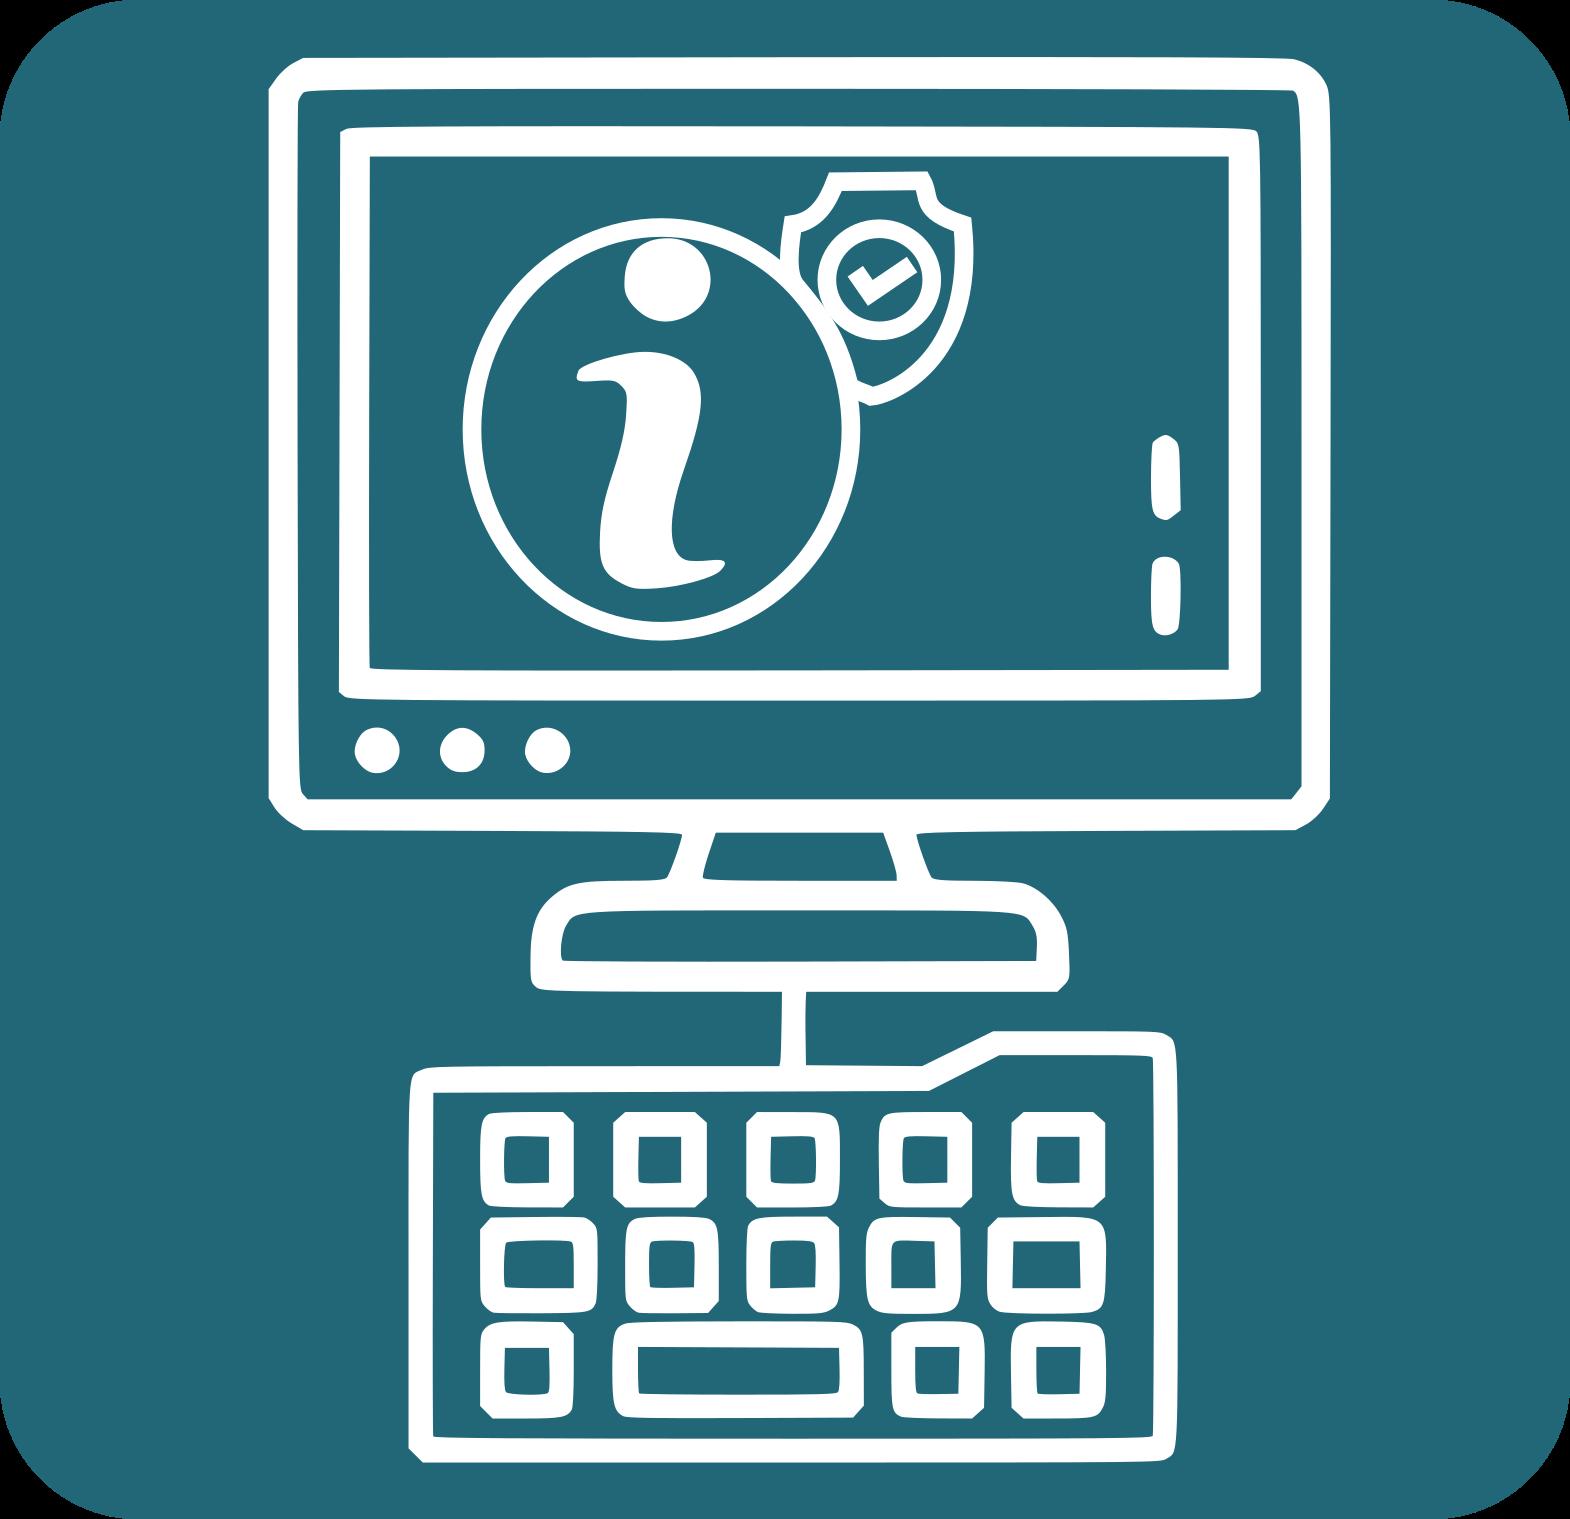 icone ordinador i internet